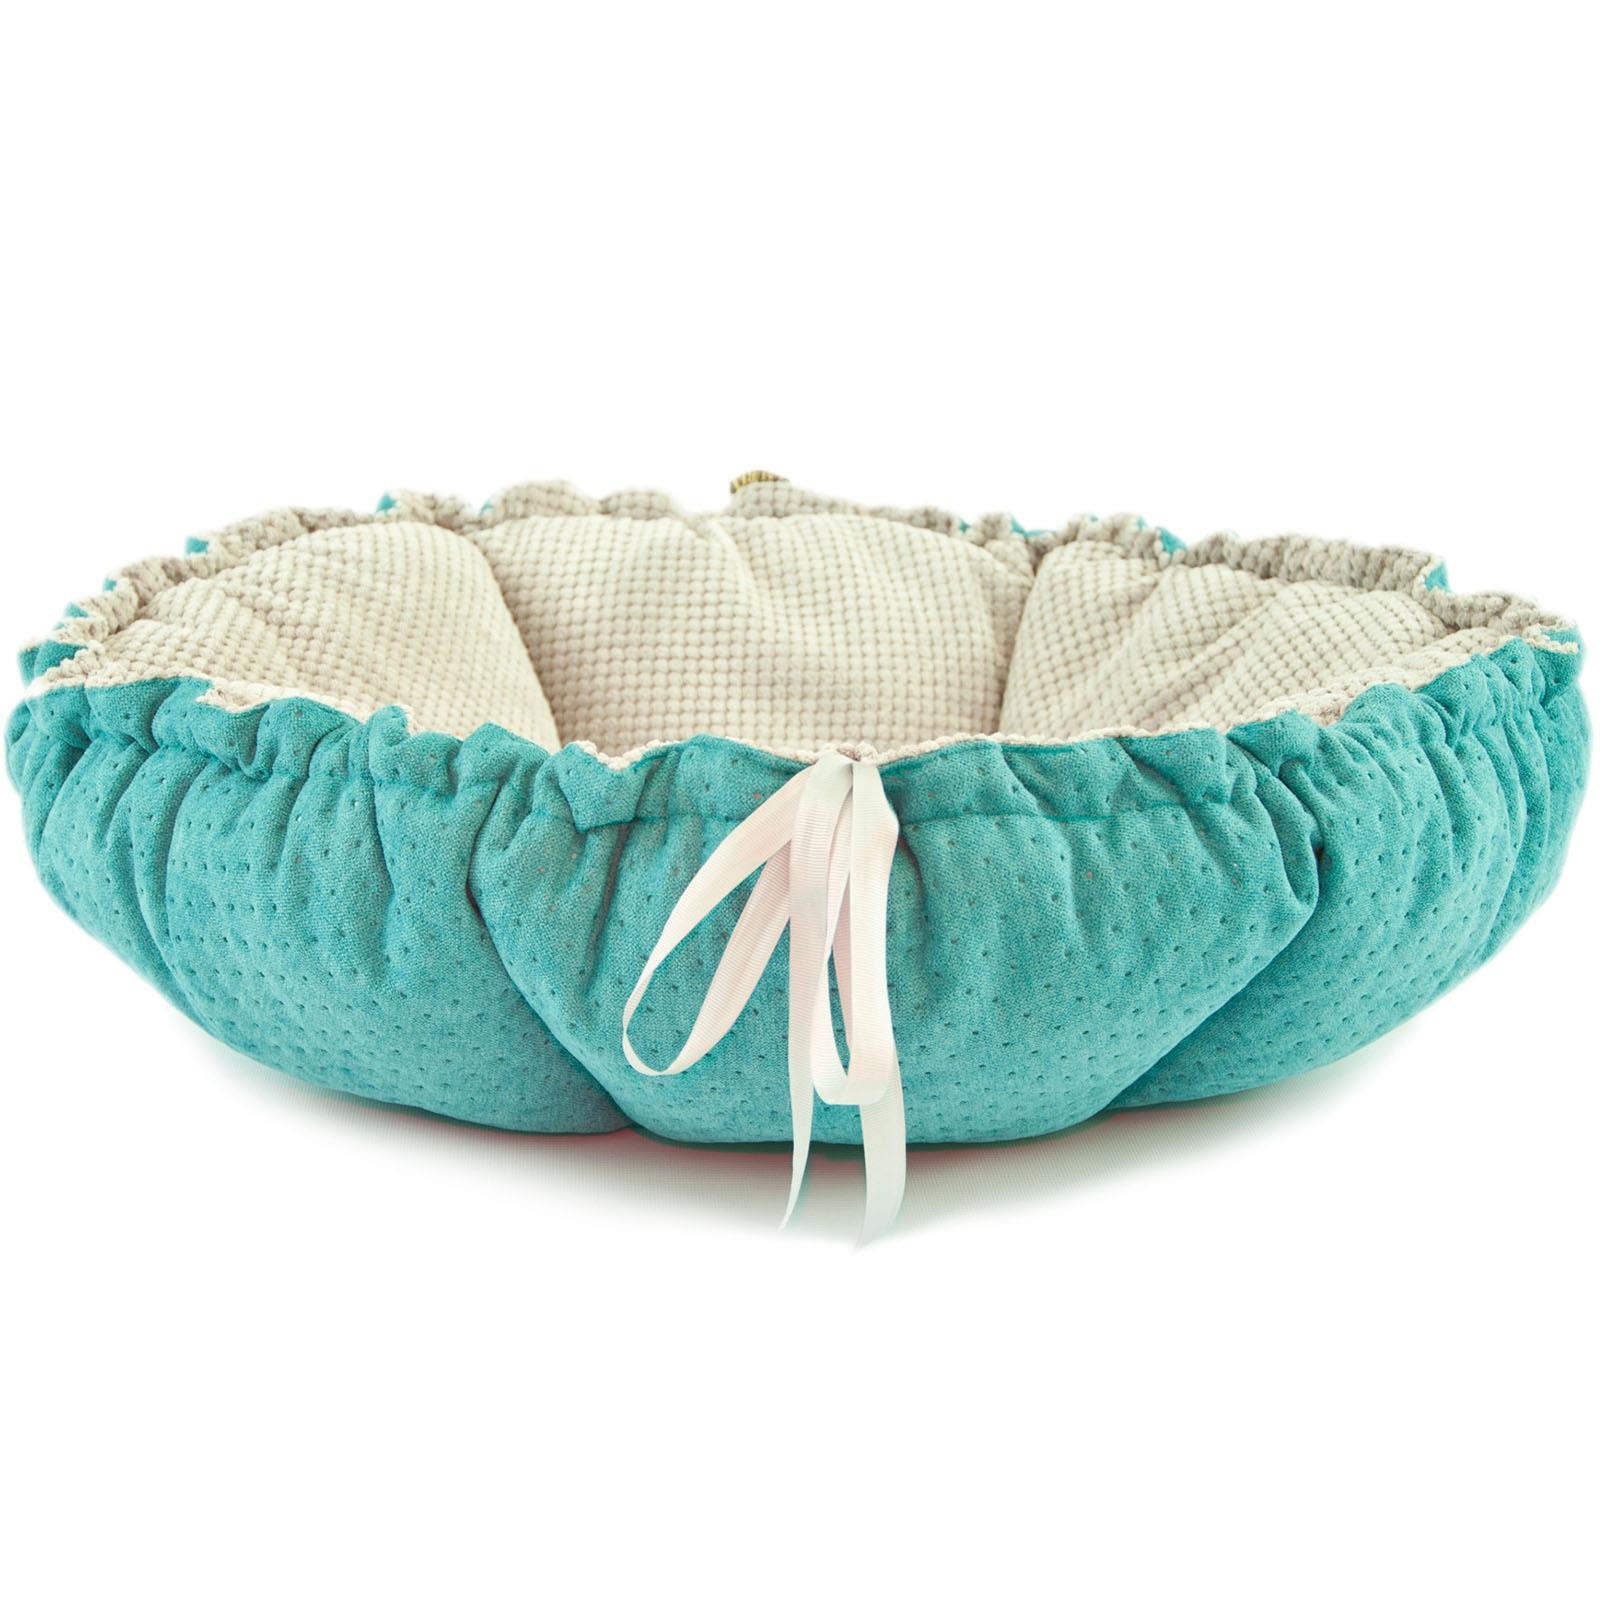 Handmade Dark Blue /& Grey 65cm Handmade Pet Cat Dog Puppy Basket Cushion Bed Sofa Mattress UK